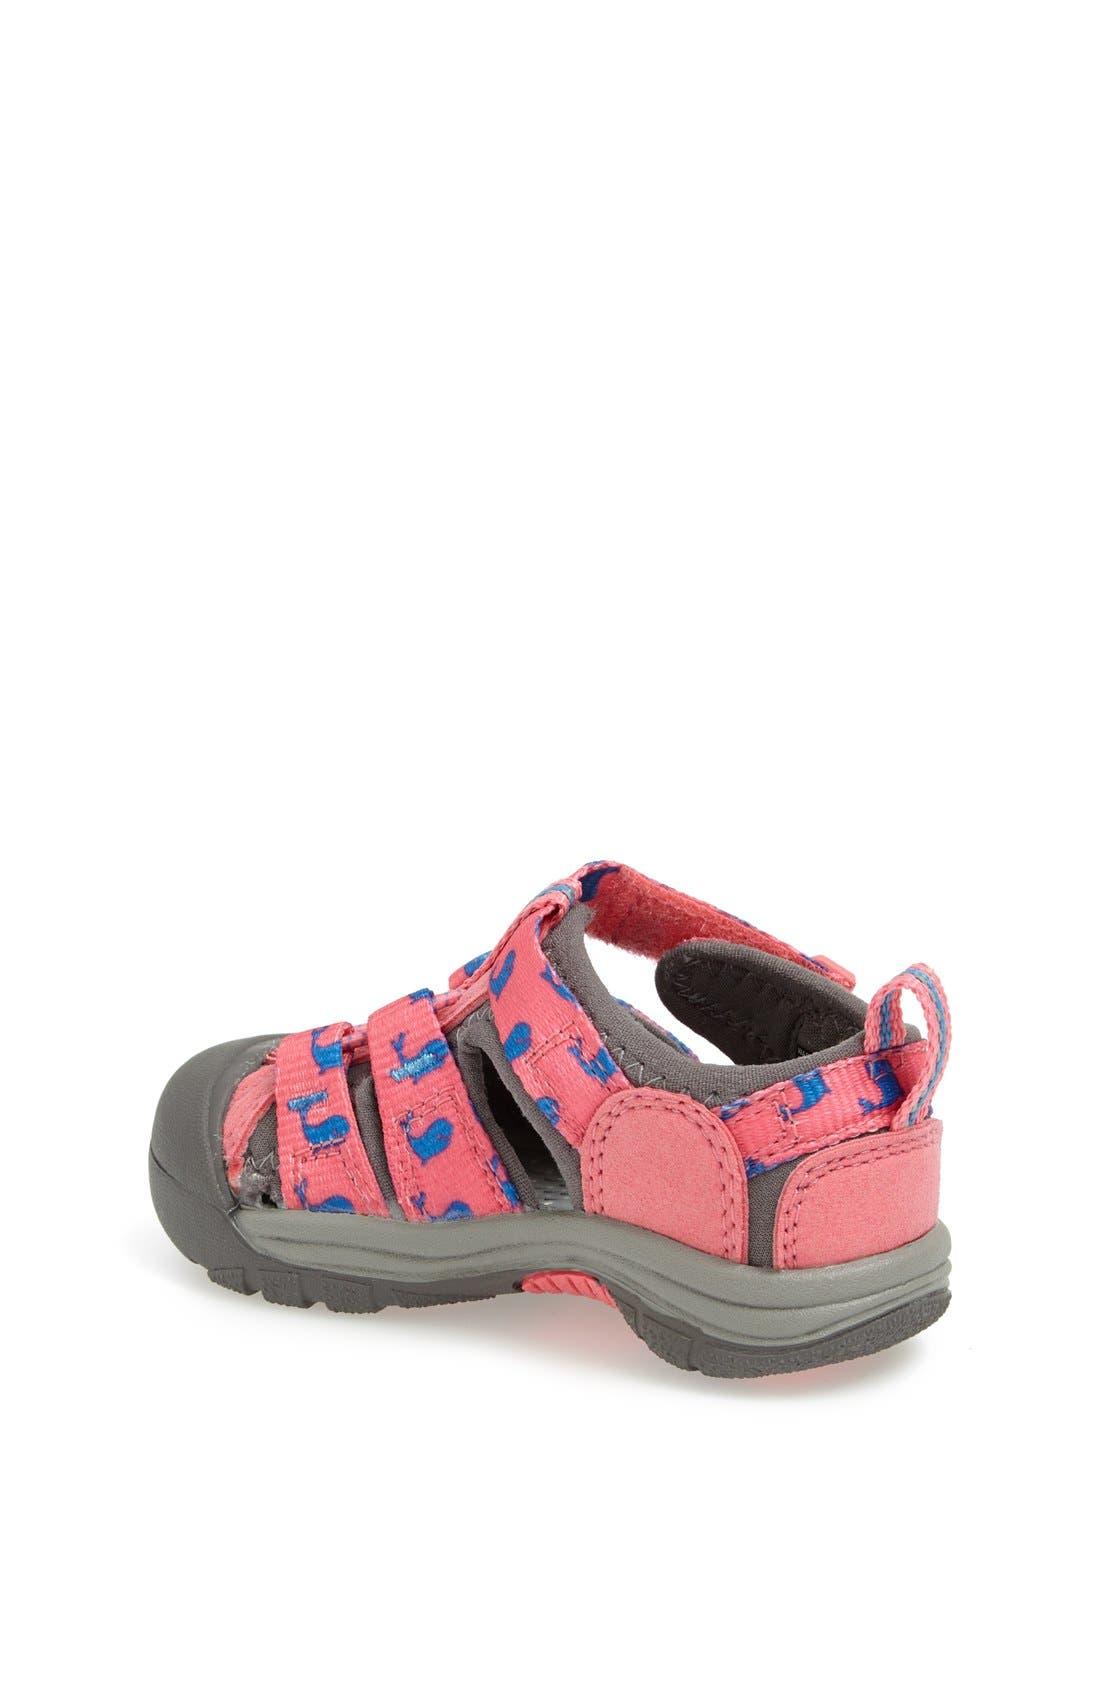 Alternate Image 2  - Keen 'Newport H2' Print Sandal (Baby & Walker)